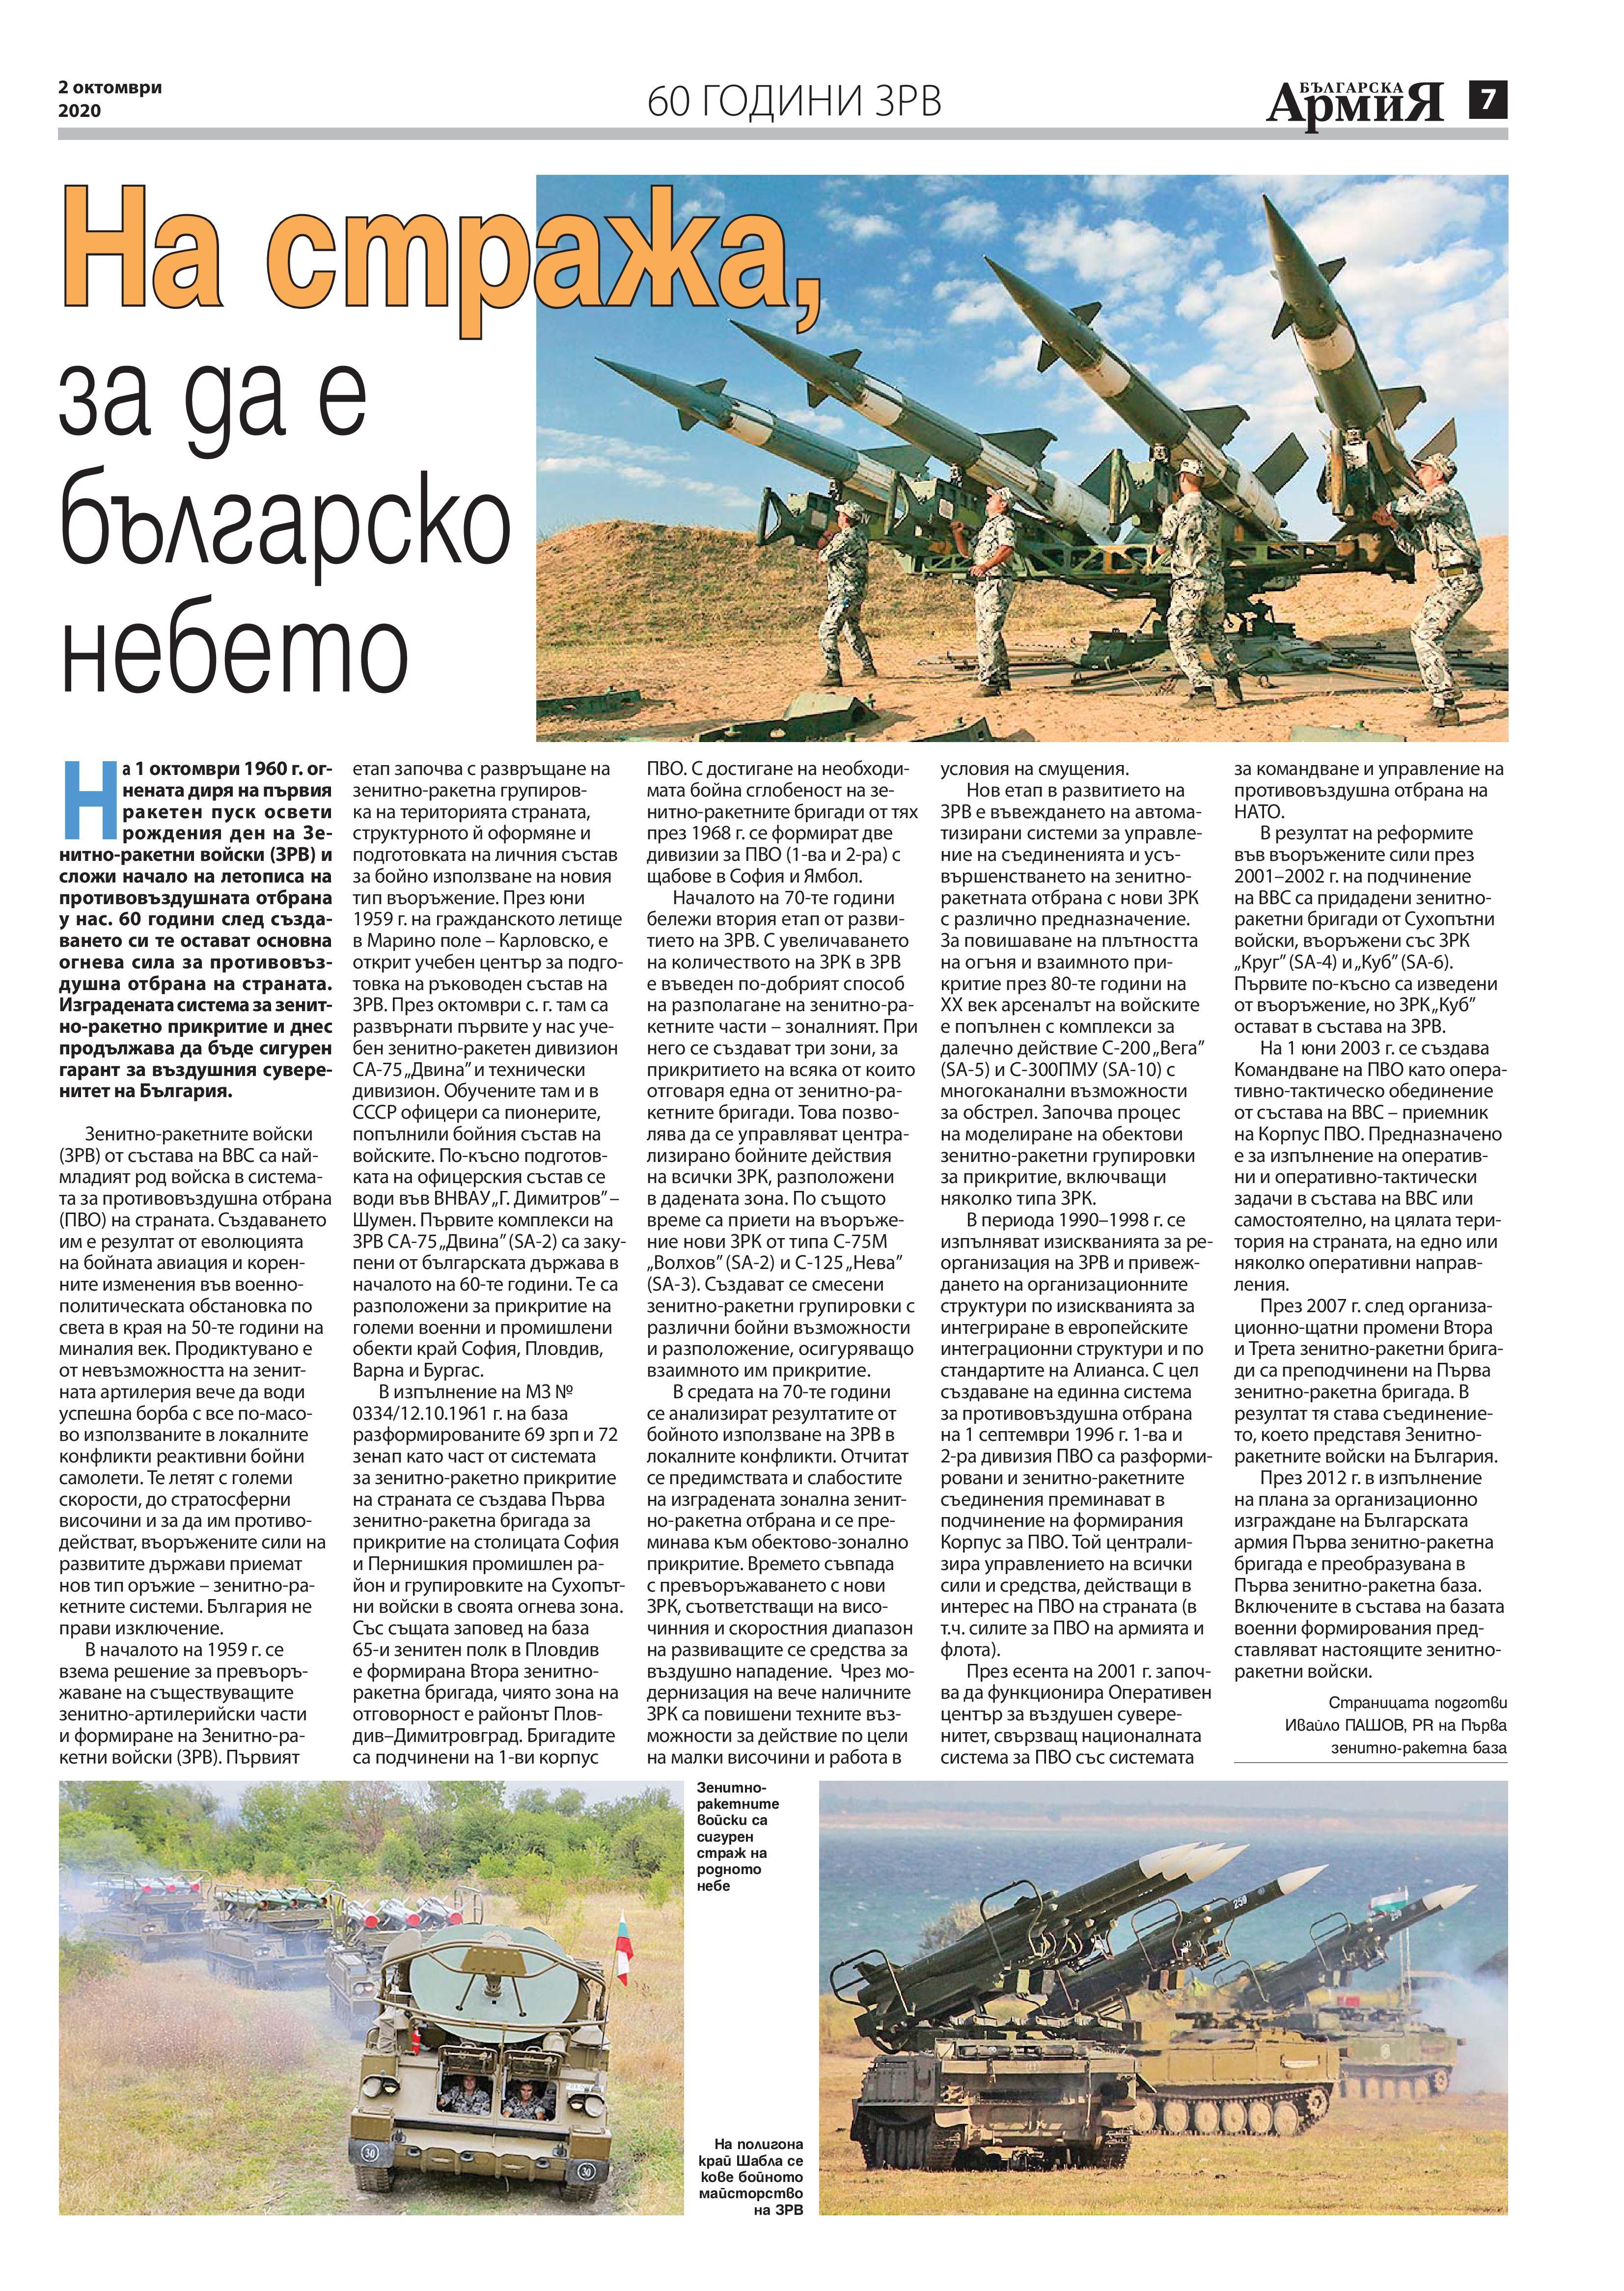 https://armymedia.bg/wp-content/uploads/2015/06/07-41.jpg